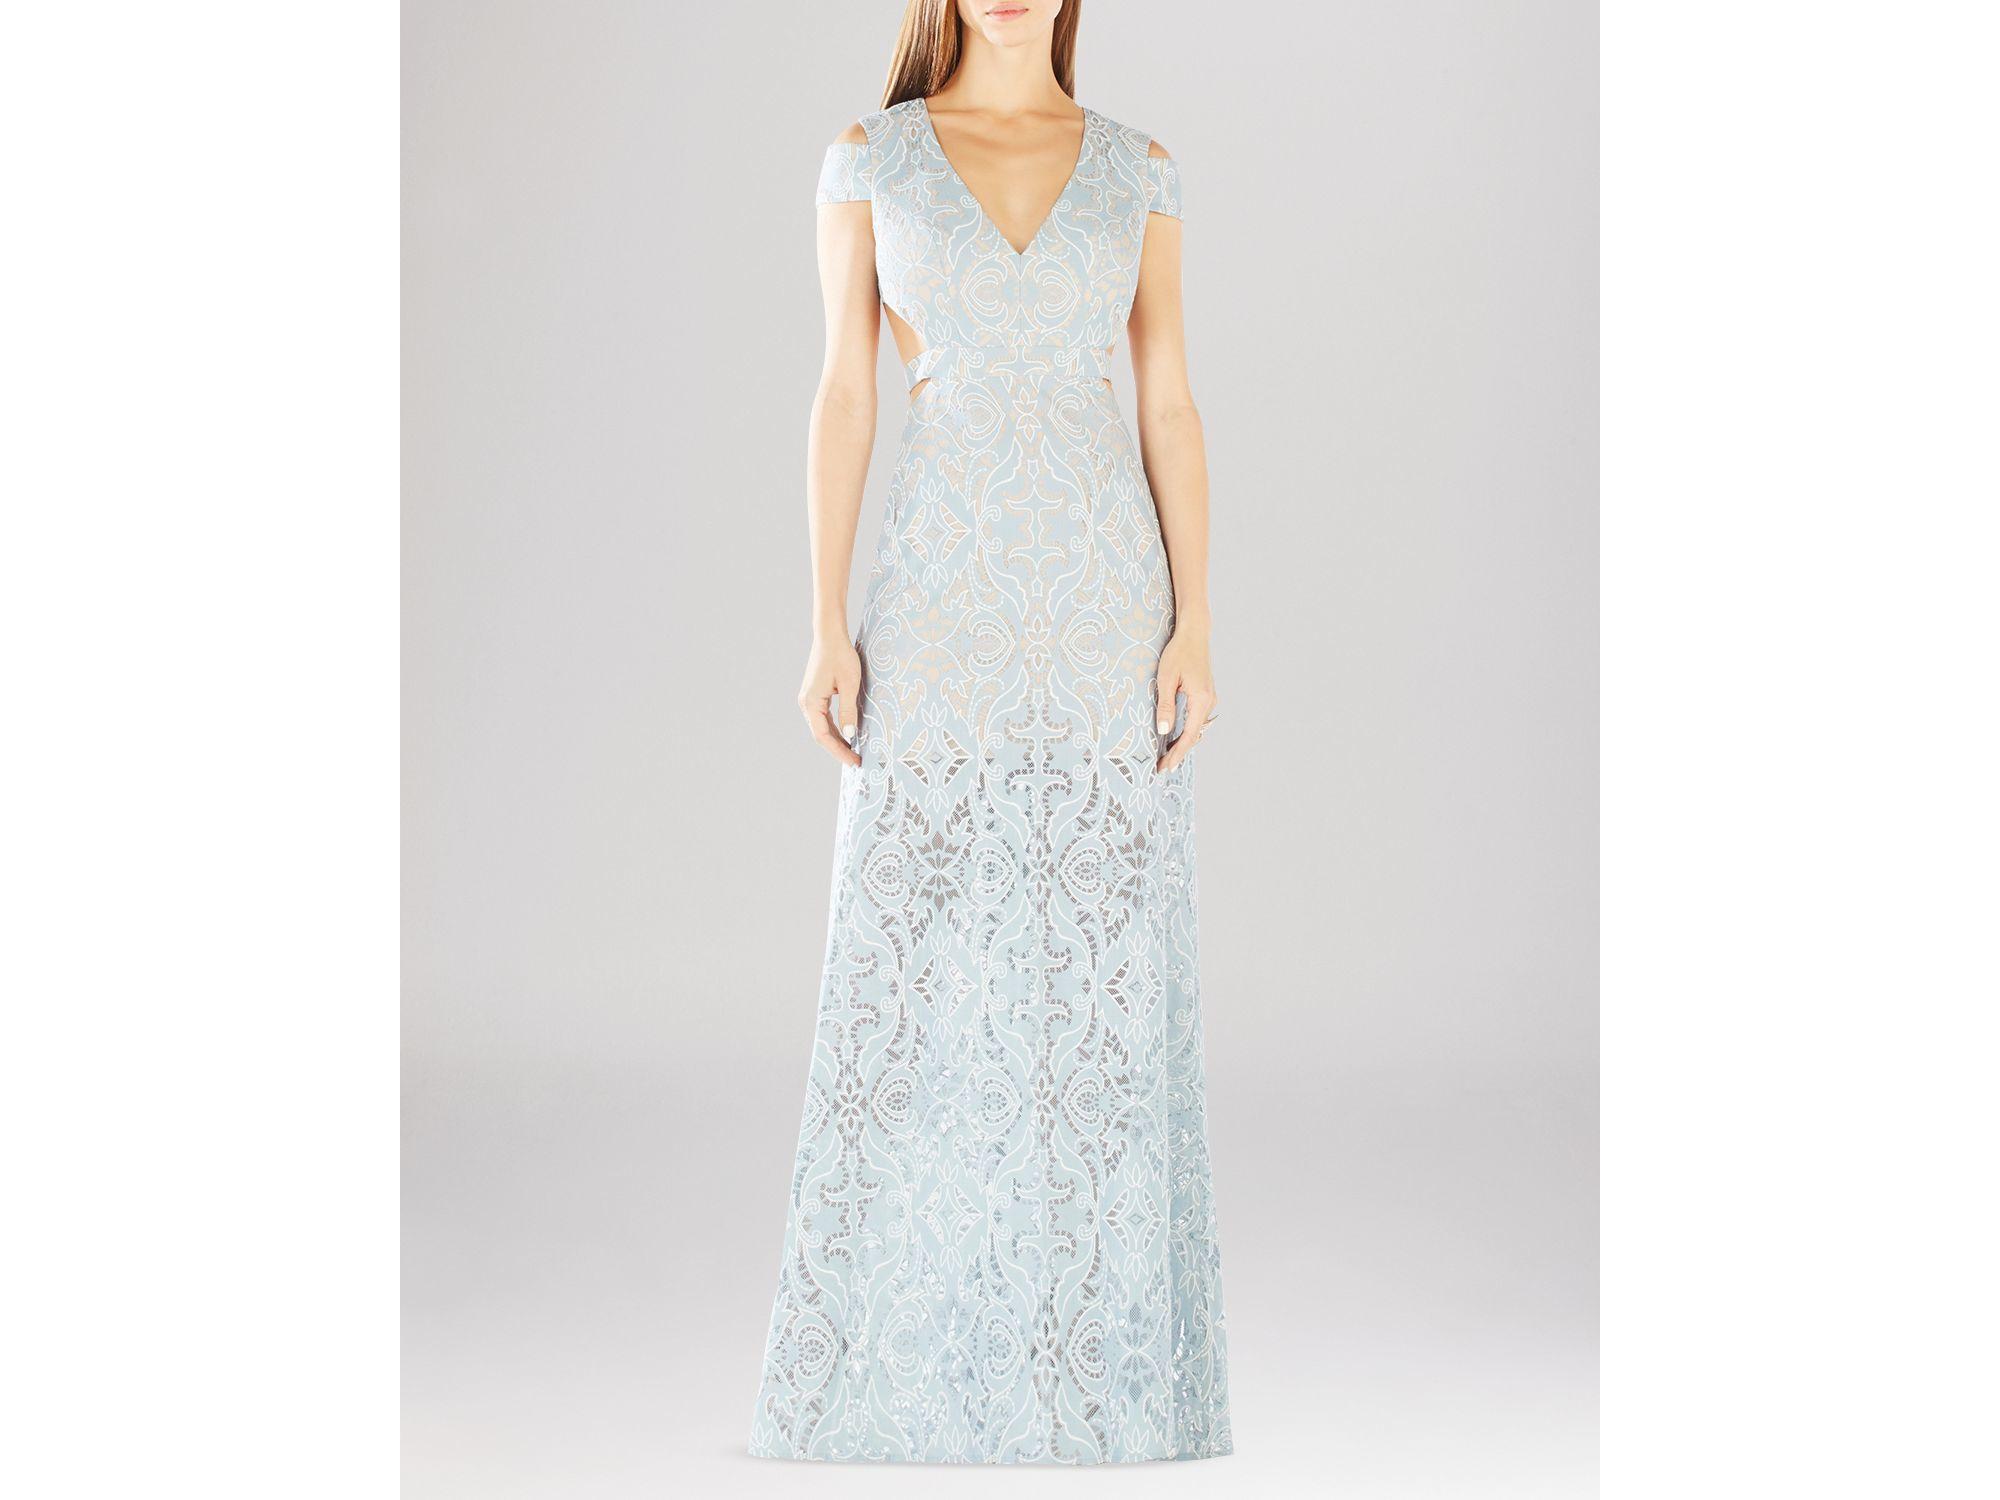 Lyst - Bcbgmaxazria Ava Cutout Lace Gown in Blue